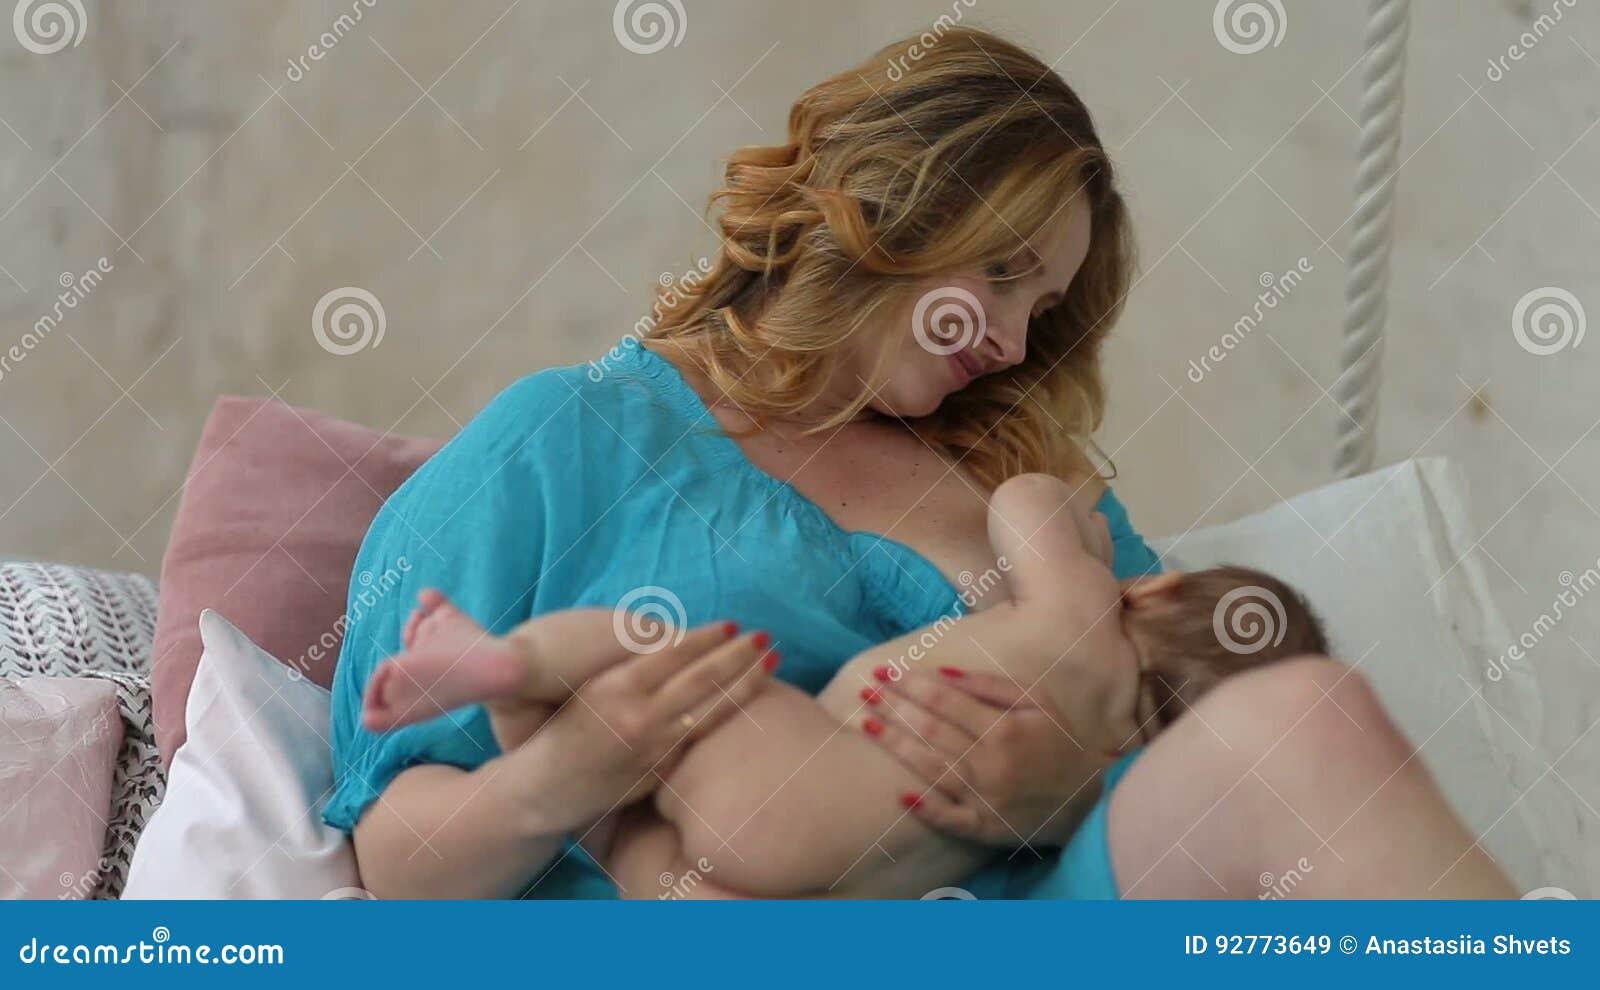 Nude girl breastfeeding nude girl